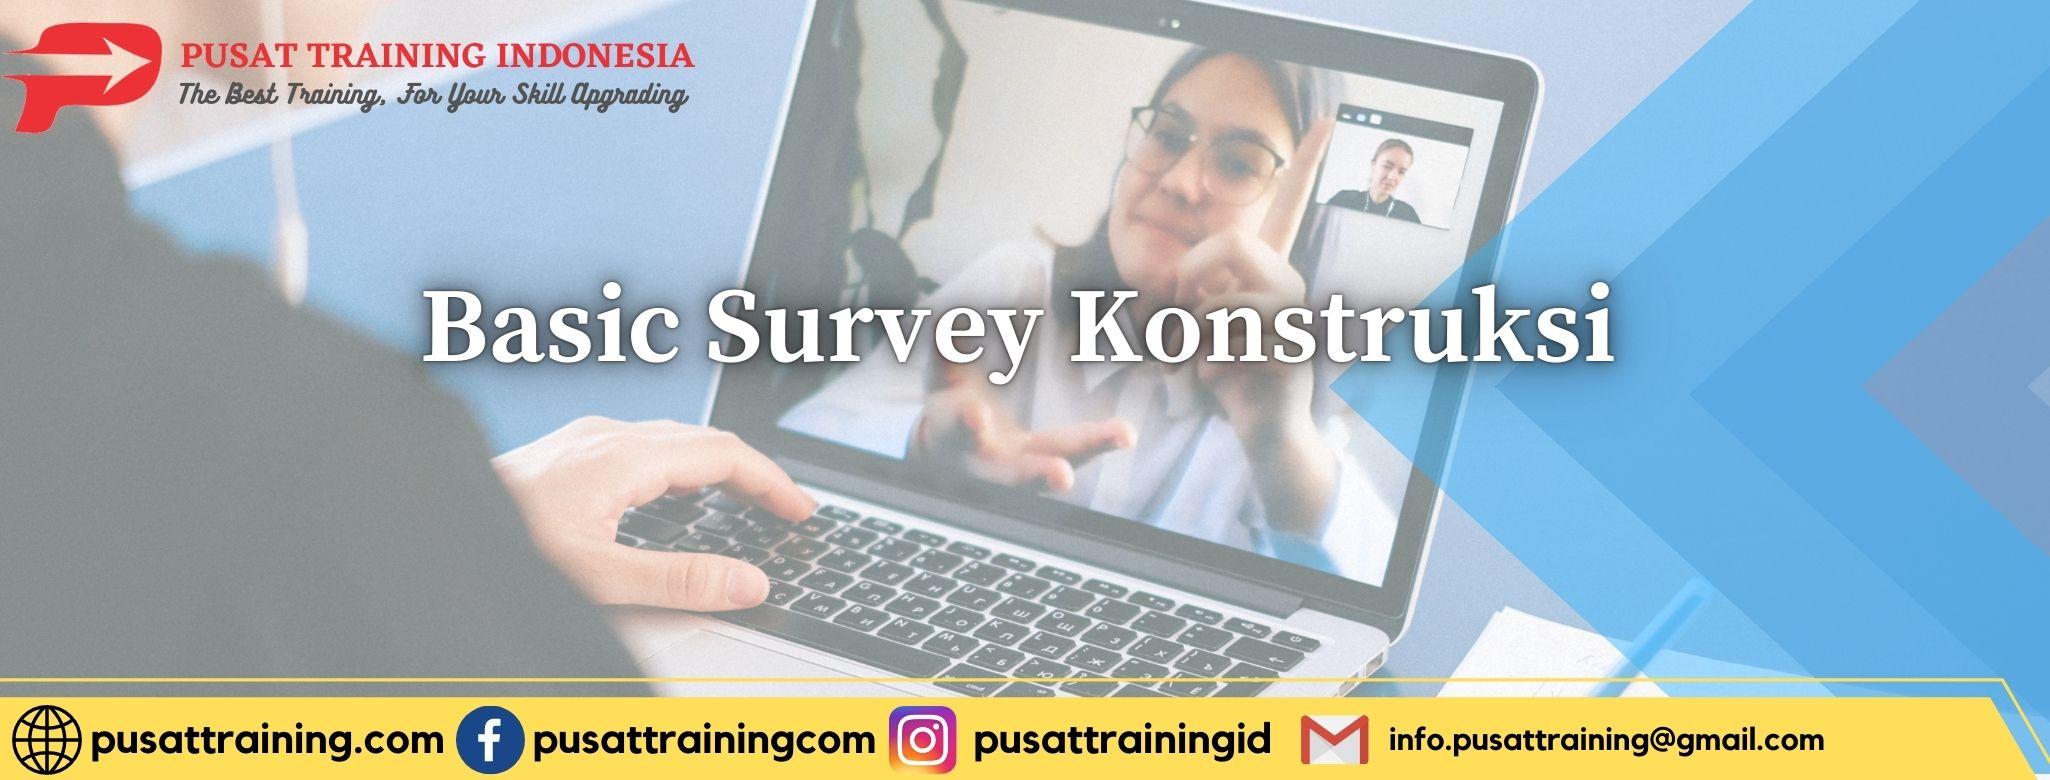 Basic-Survey-Konstruksi